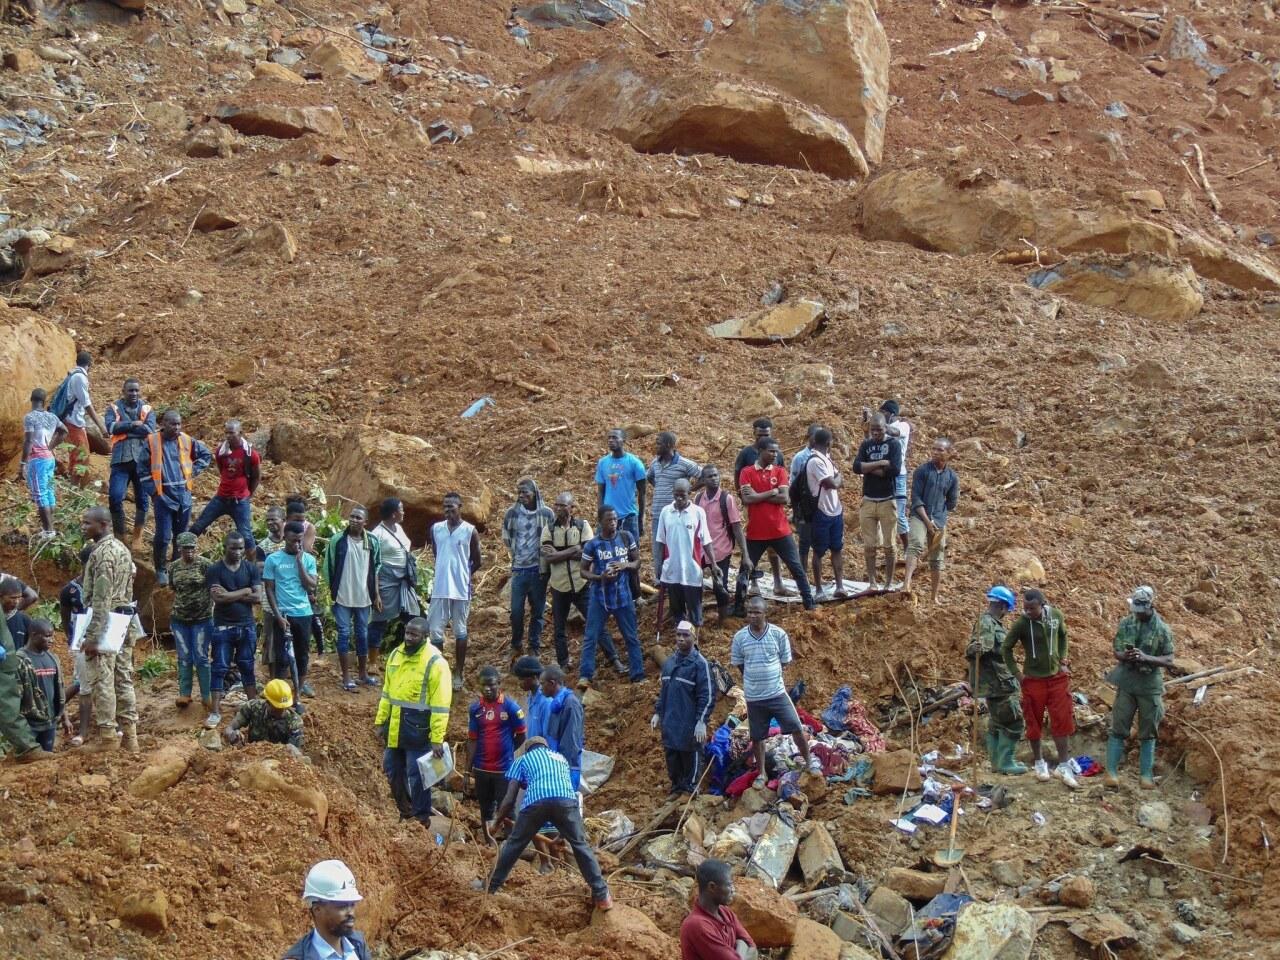 Deadly mudslides in Sierra Leone